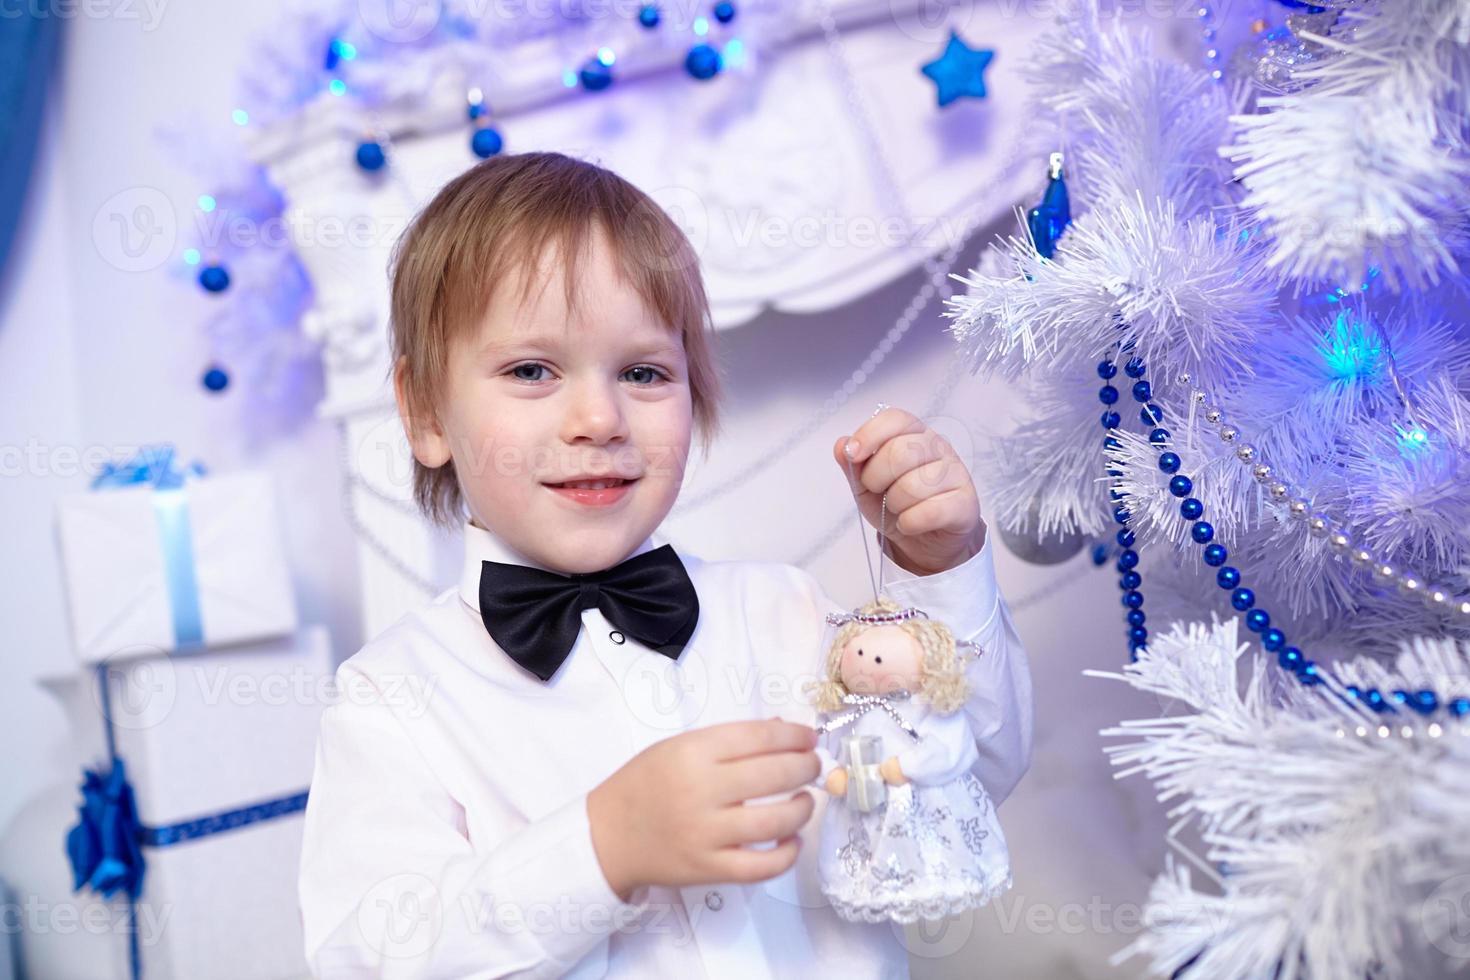 menino de camisa e gravata borboleta decora um natal tr foto